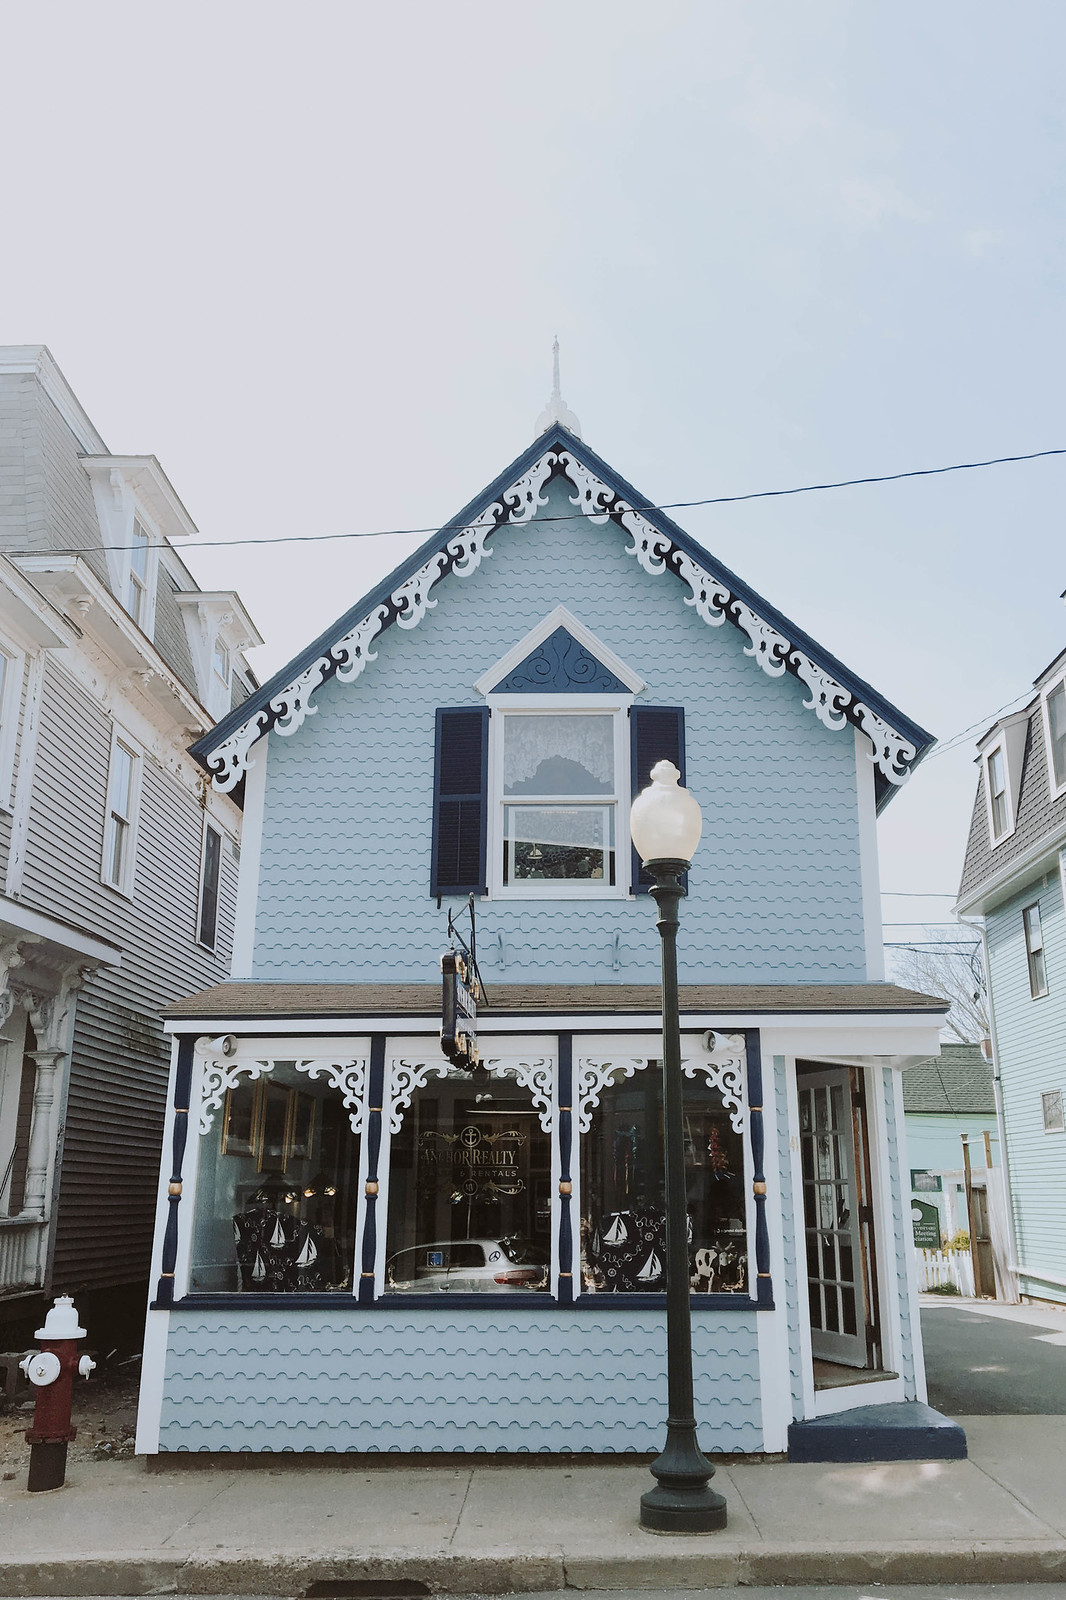 Marthas Vineyard Gingerbread Houses on http://juliettelaura.blogspot.com/